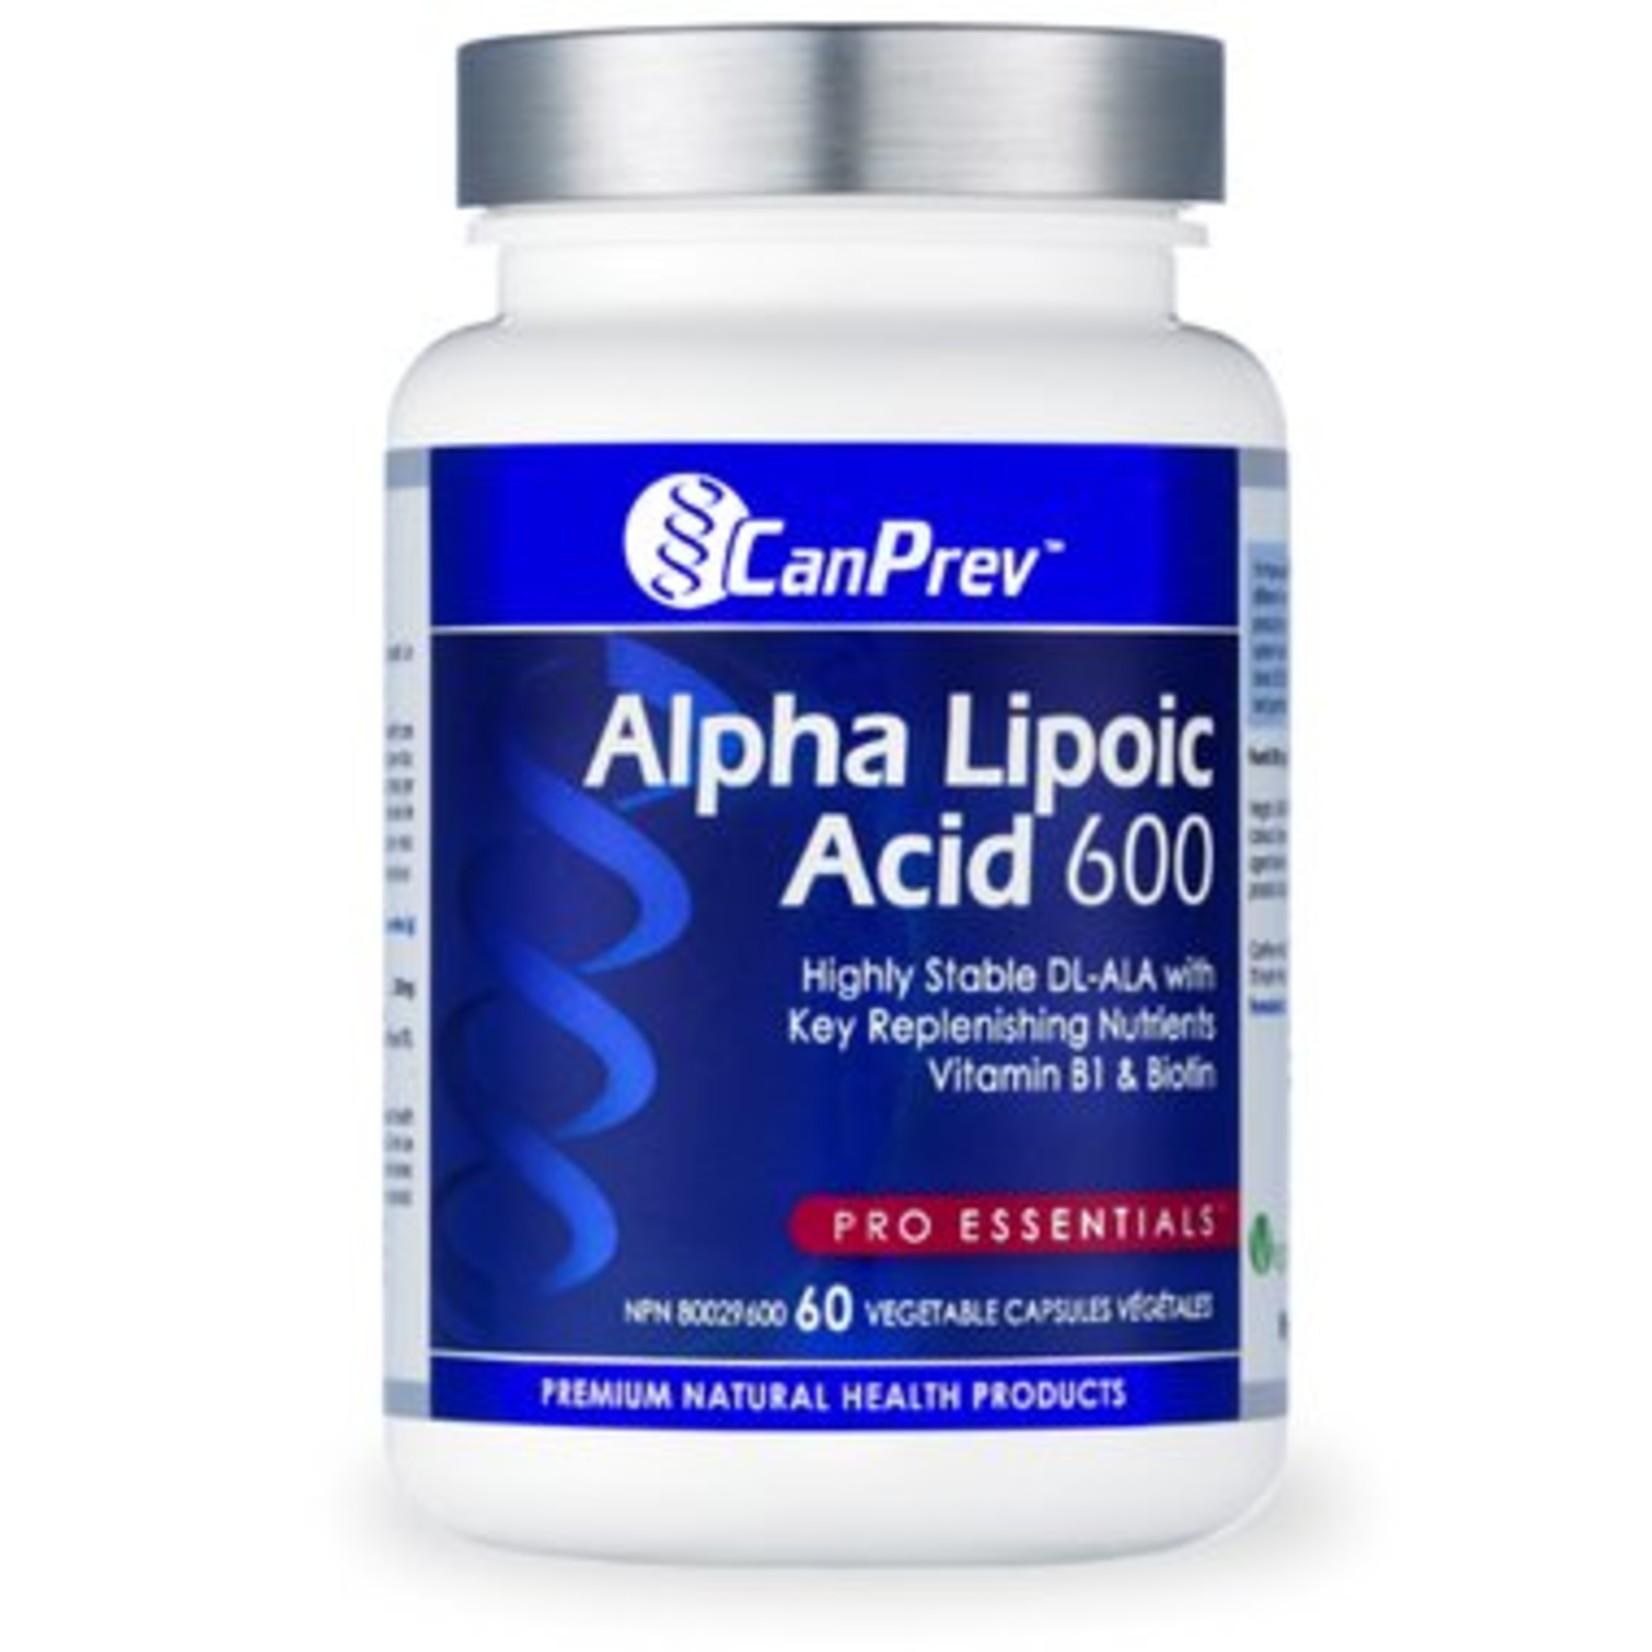 Can Prev Can Prev Alpha Lipoic Acid 600 mg 60 v-caps